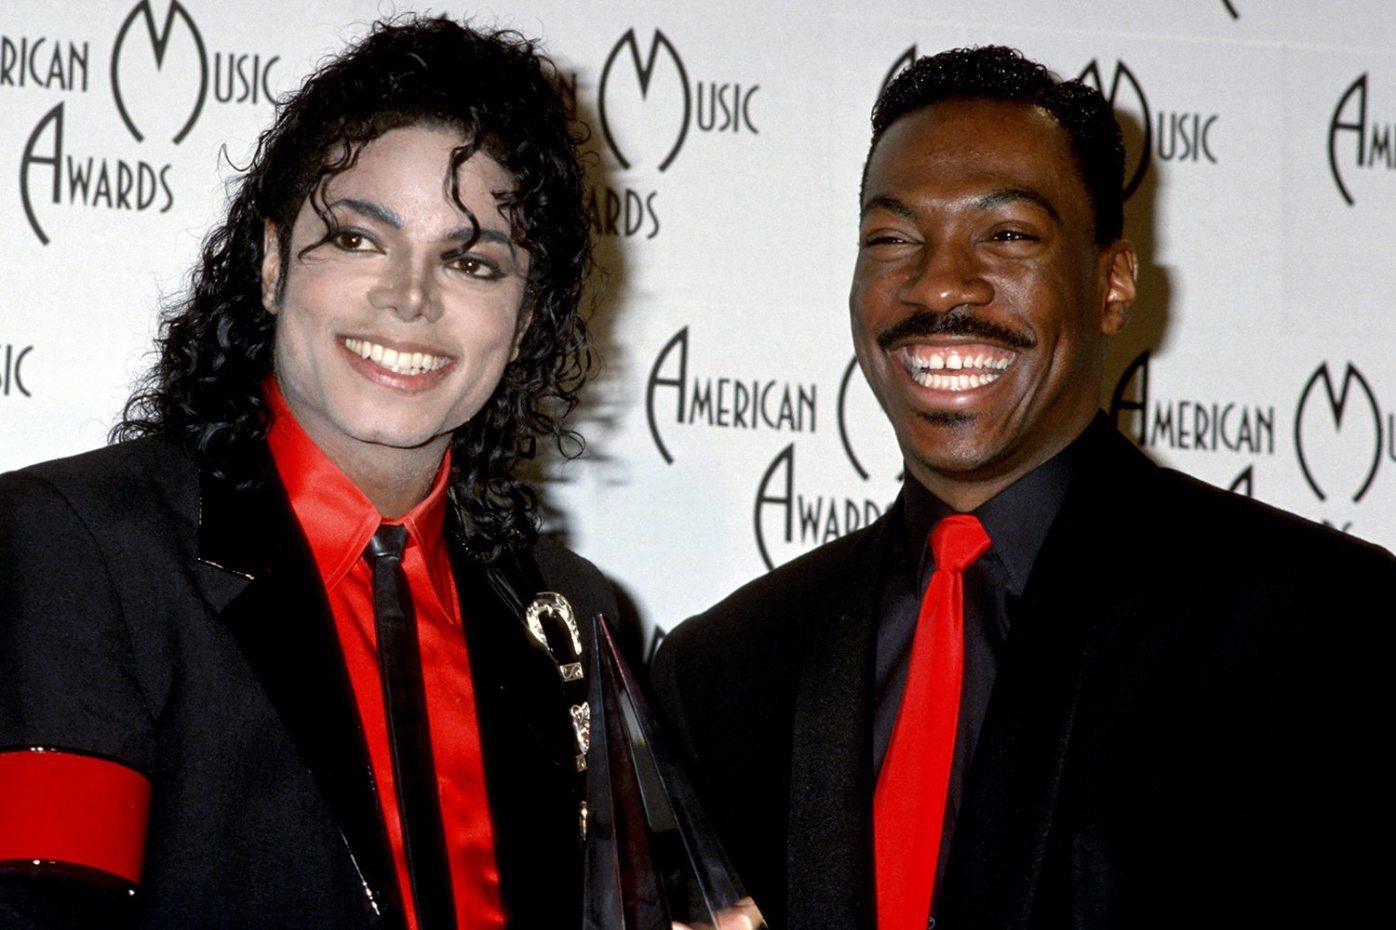 16th Annual American Music Awards